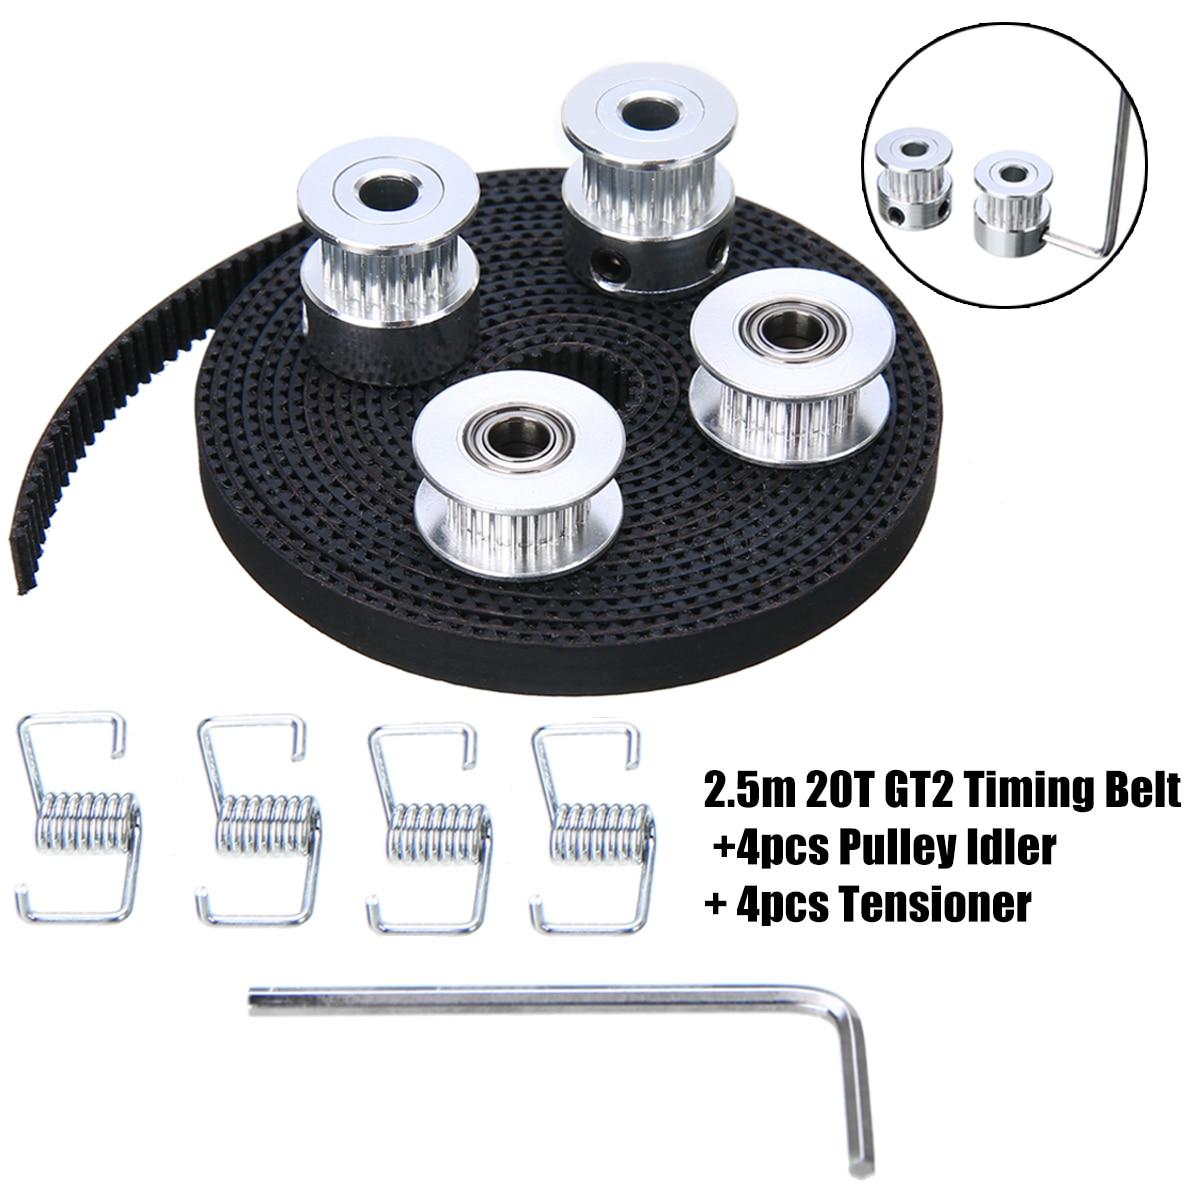 New 25m 20t Gt2 Timing Belt 4pcs Pulley Idler Tensioner 3d Tool Printer